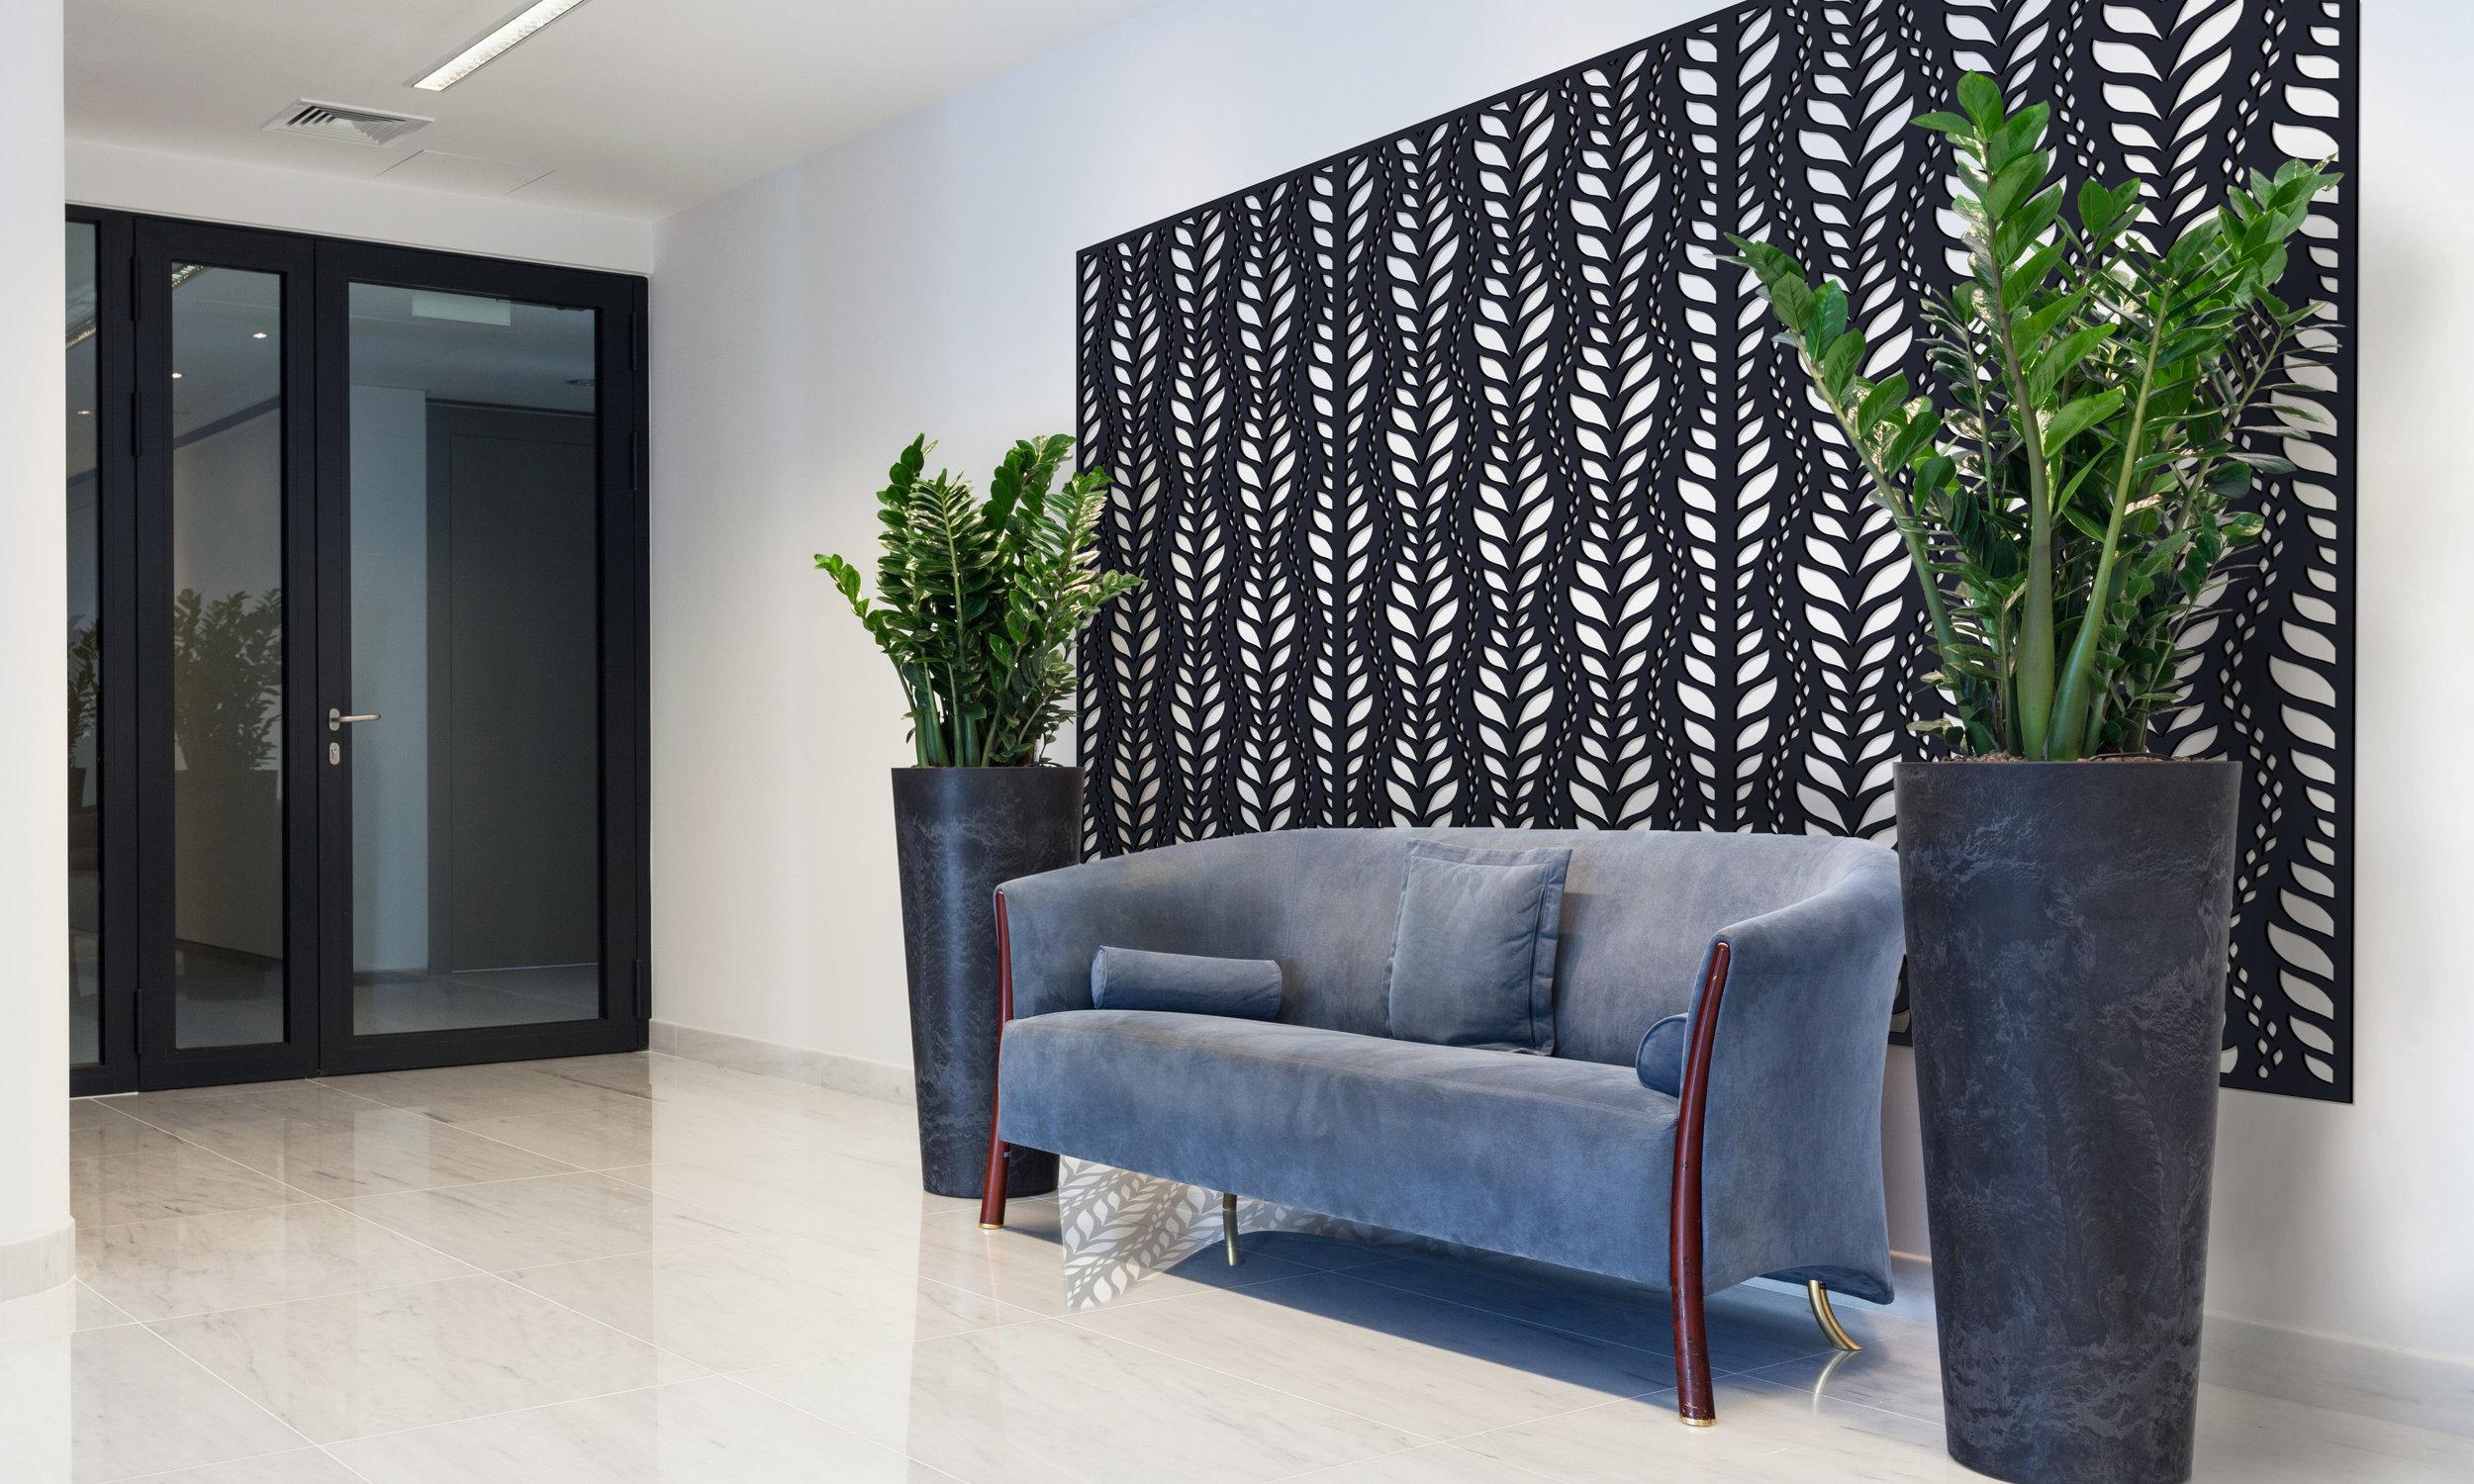 Installation Rendering B   La Jolla decorative office wall panel - painted